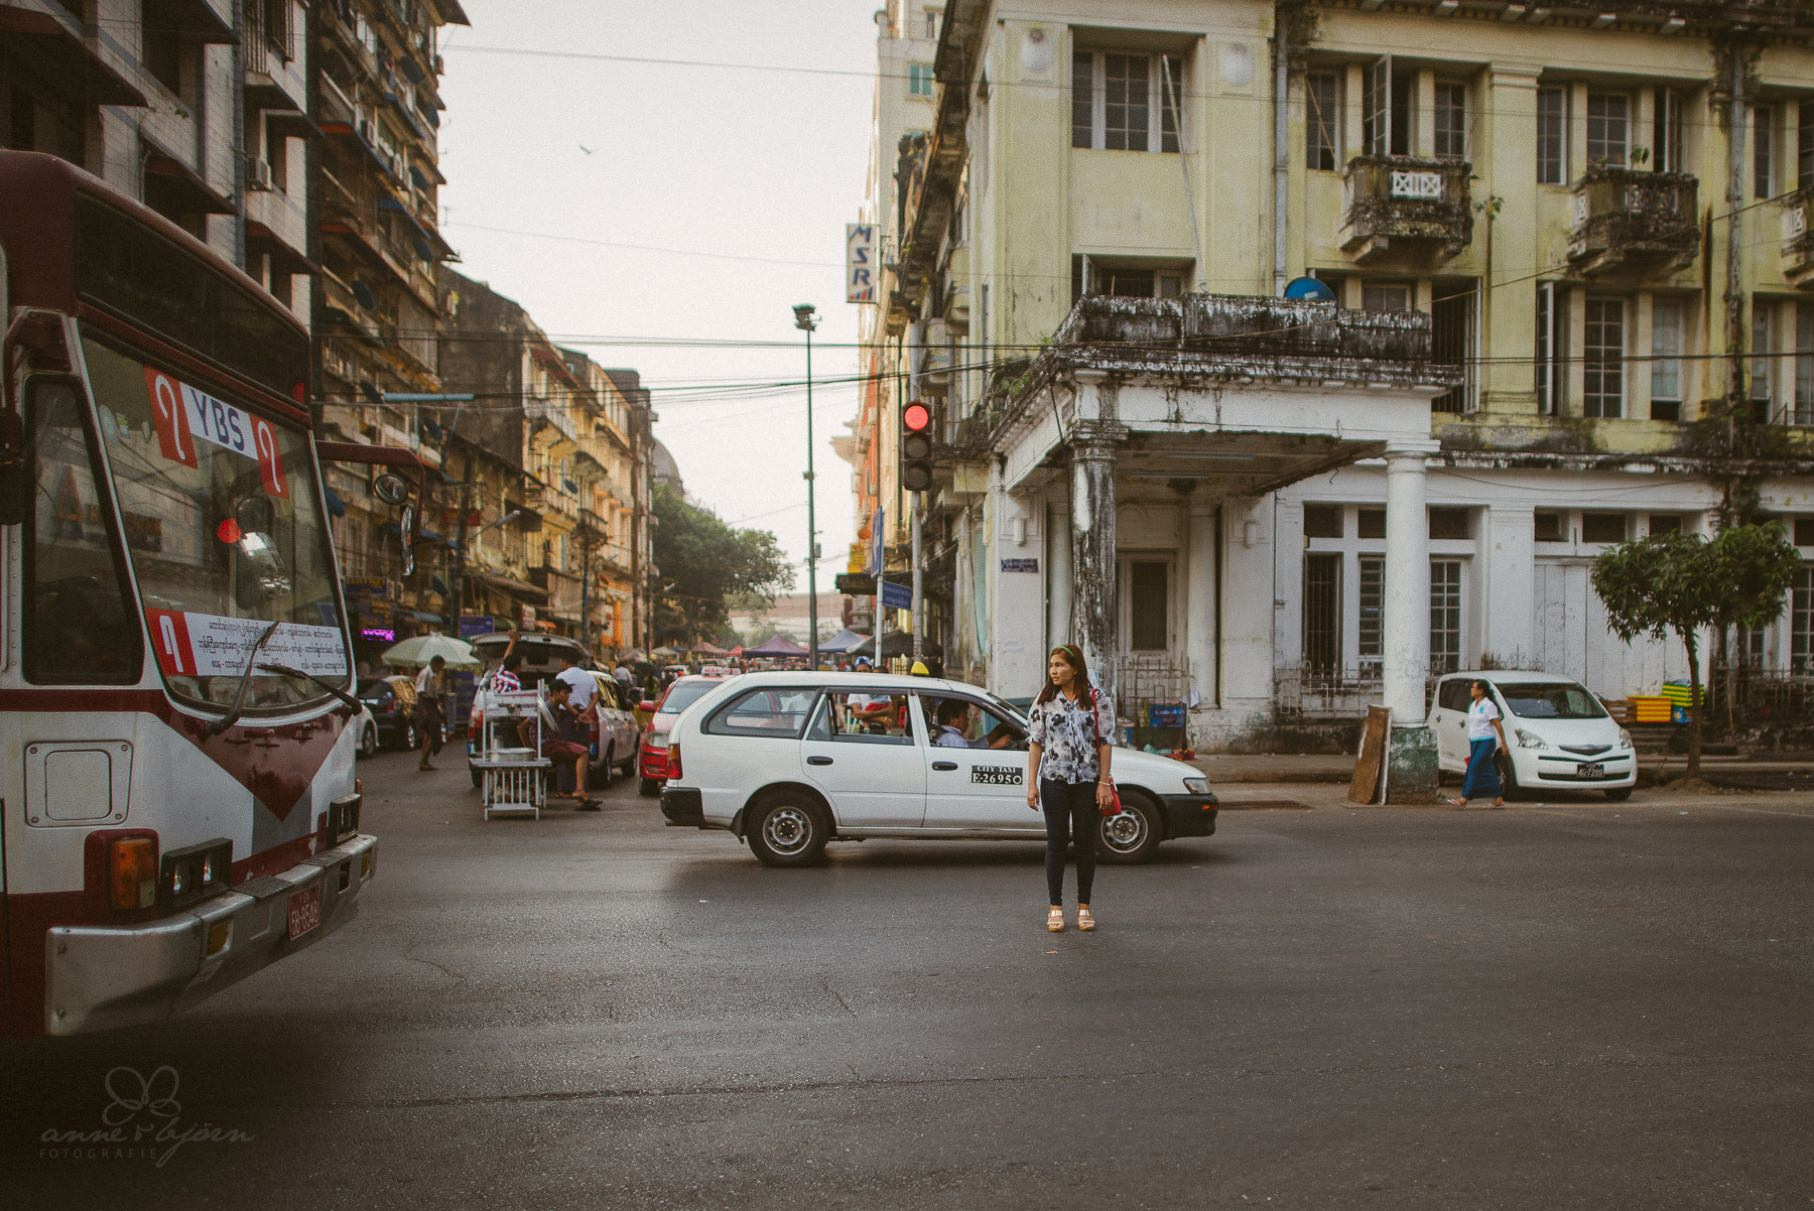 0002 yangon mandalay d76 4196 - Großstädte Myanmars - Yangon & Mandalay